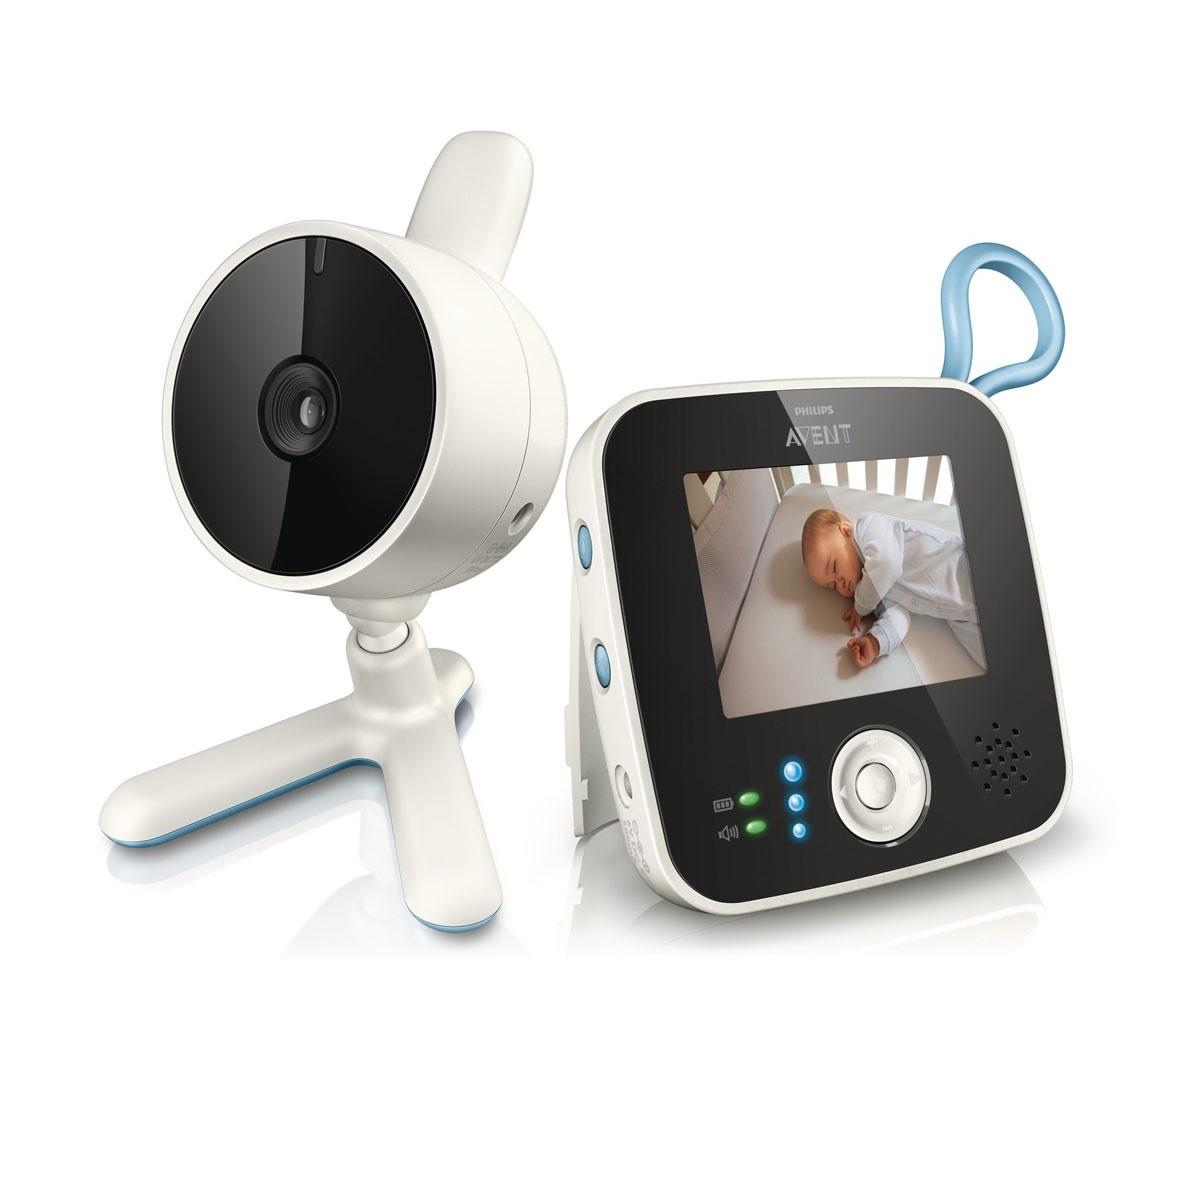 Видеоняня Philips Avent SCD-610 - Электронные приборы, артикул: 162703